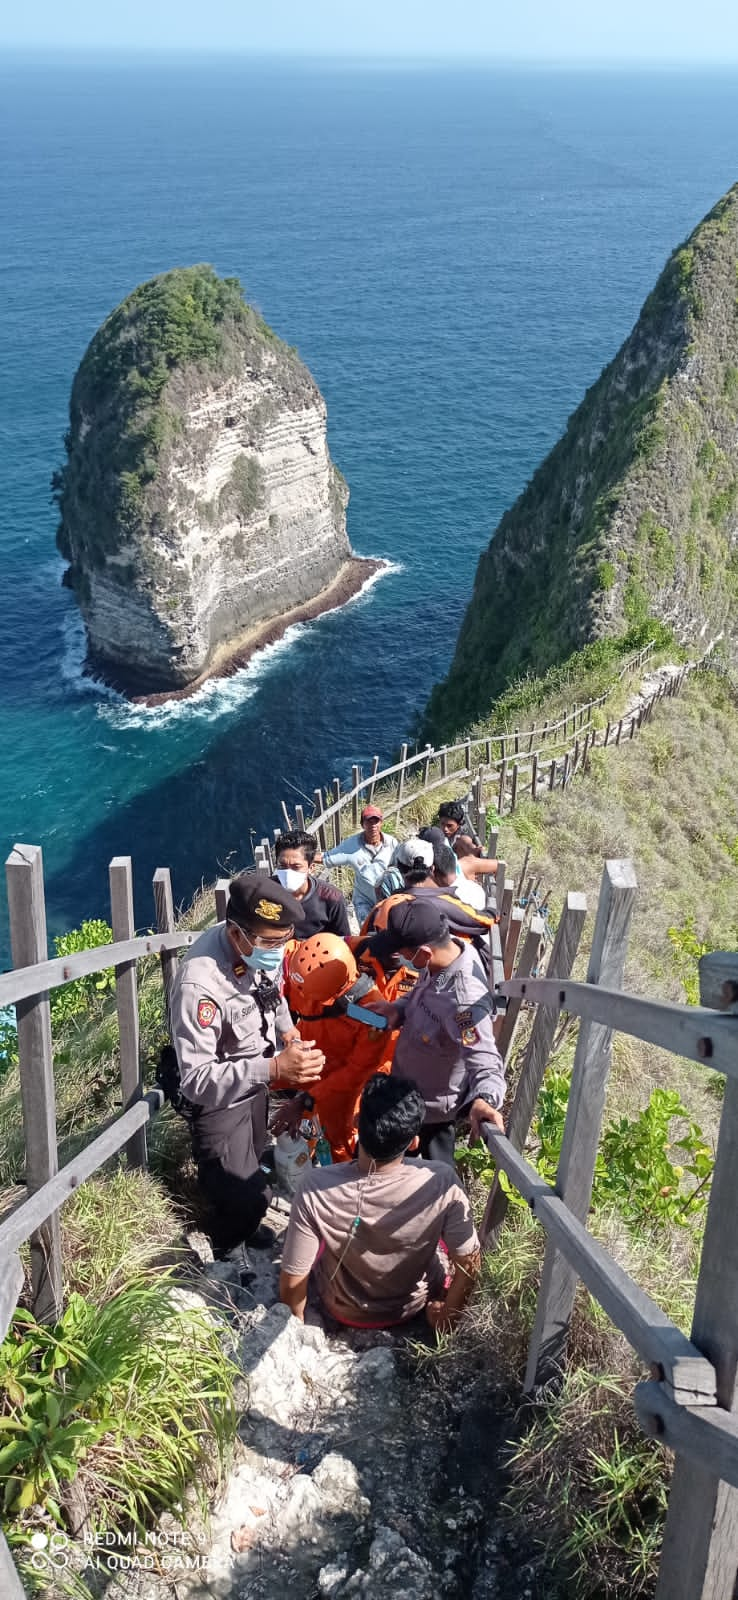 PETUGAS gabungan mengevakuasi korban terseret ombak menuju atas tebing Pantai Klingking, Nusa Penida, Minggu (8/8/2021). Foto: ist